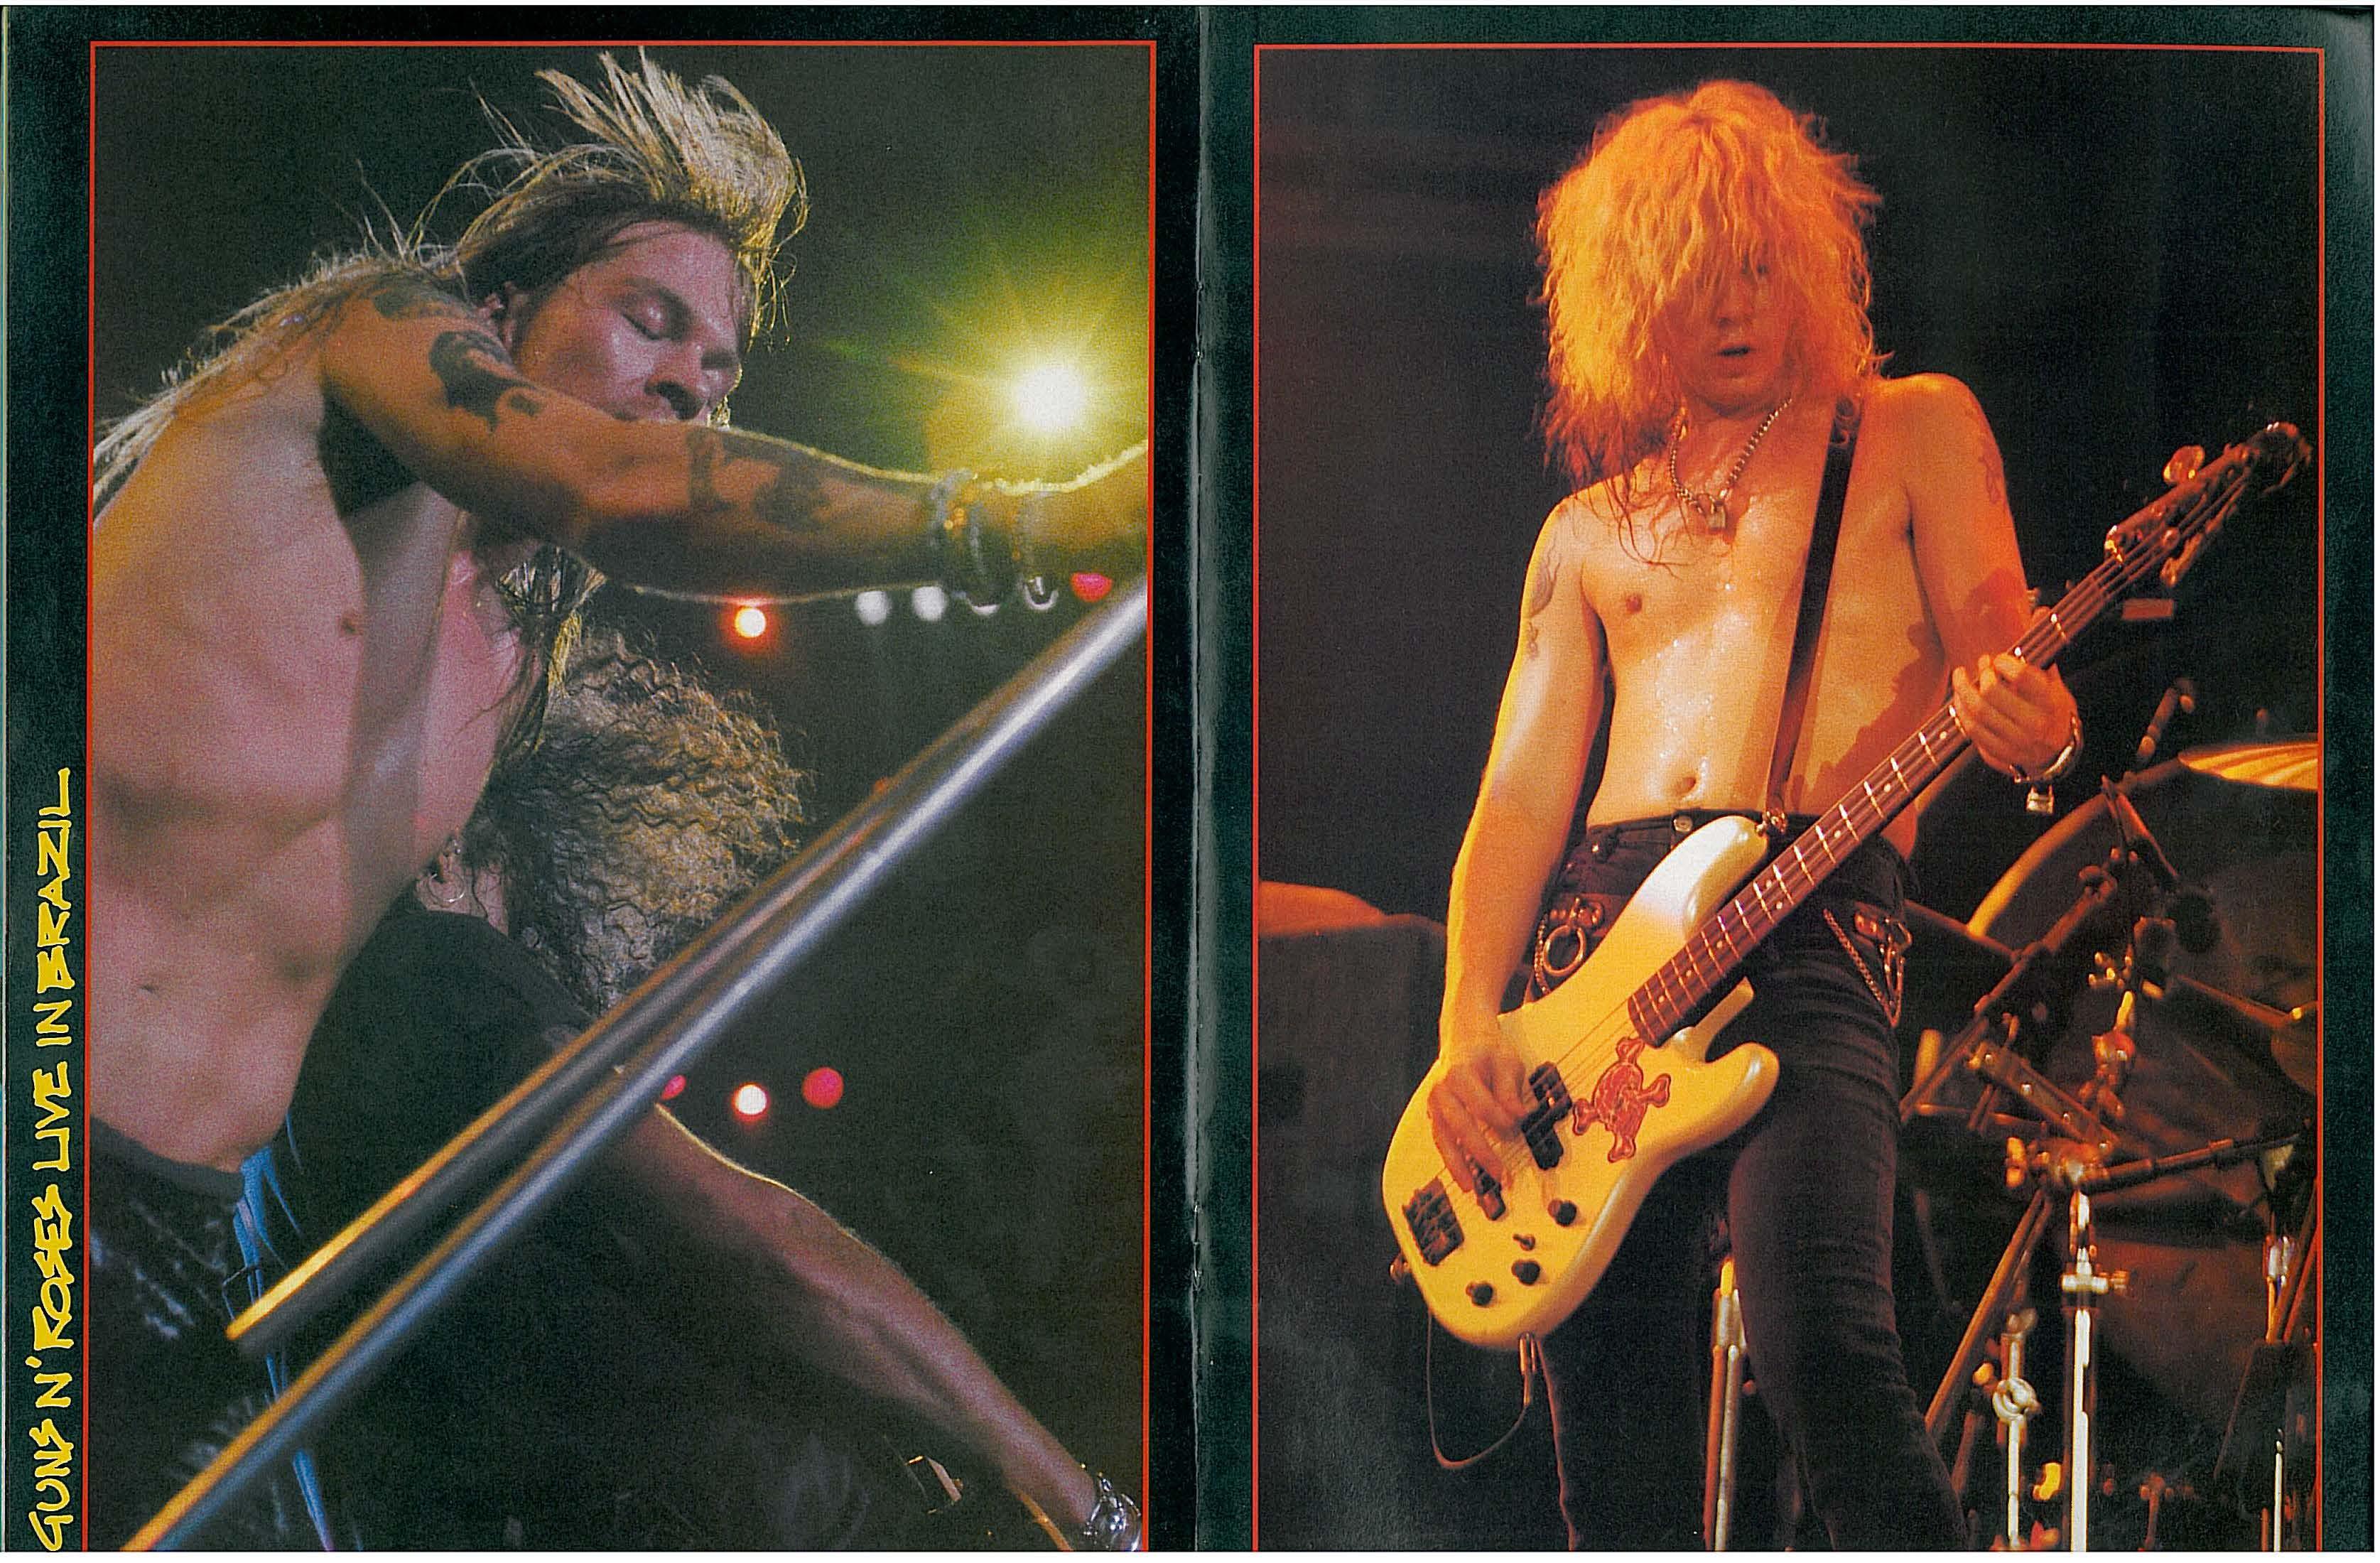 1991.02.09/16/23 - Kerrang - The Noize from Brazil (I, II, III) KkBSm4Mj_o